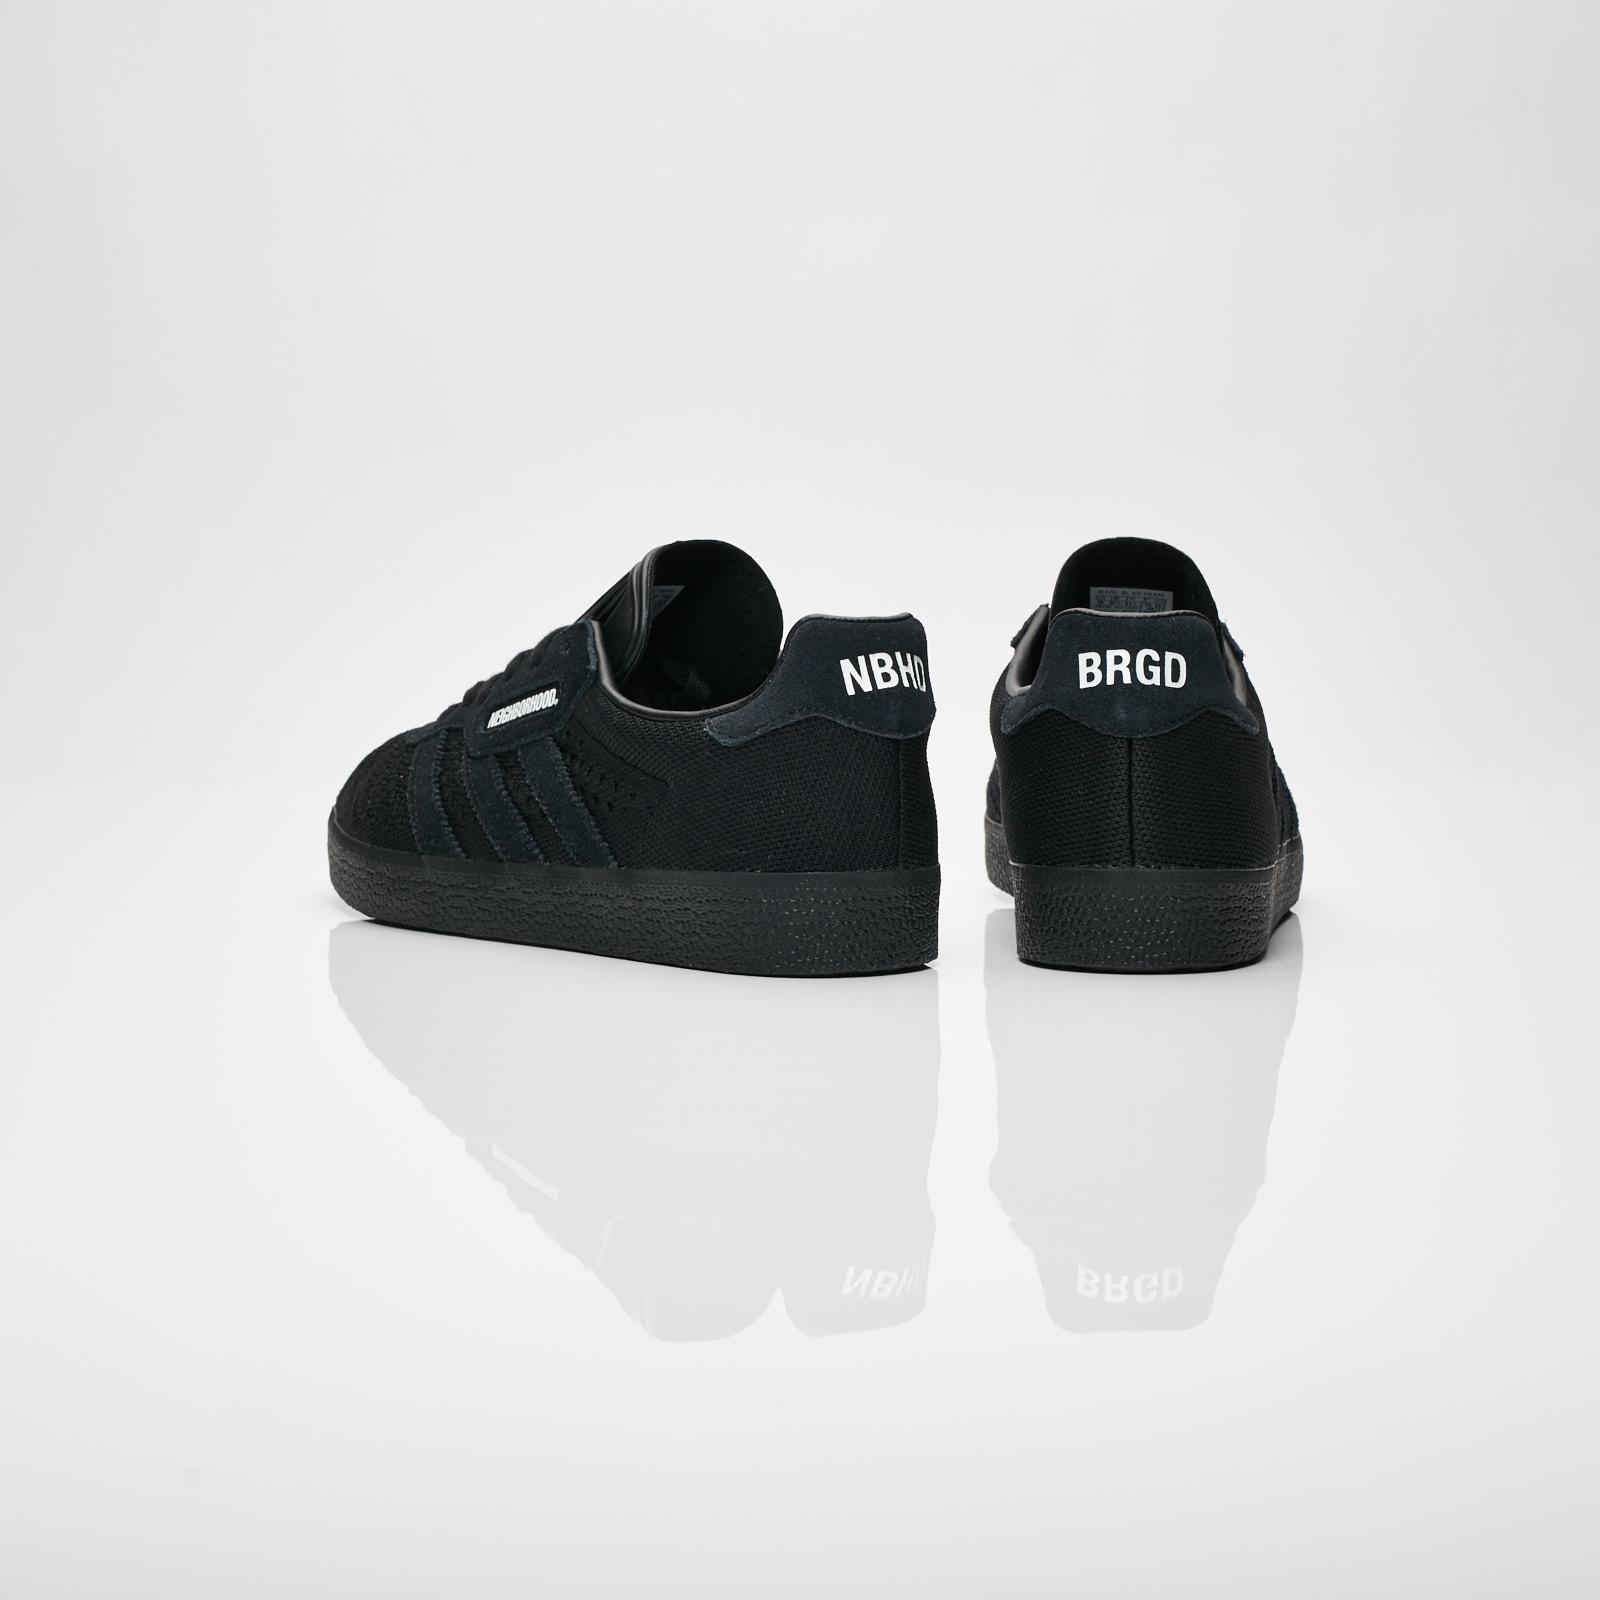 adidas Gazelle Super x Neighborhood - Da8836 - SNS | sneakers ...